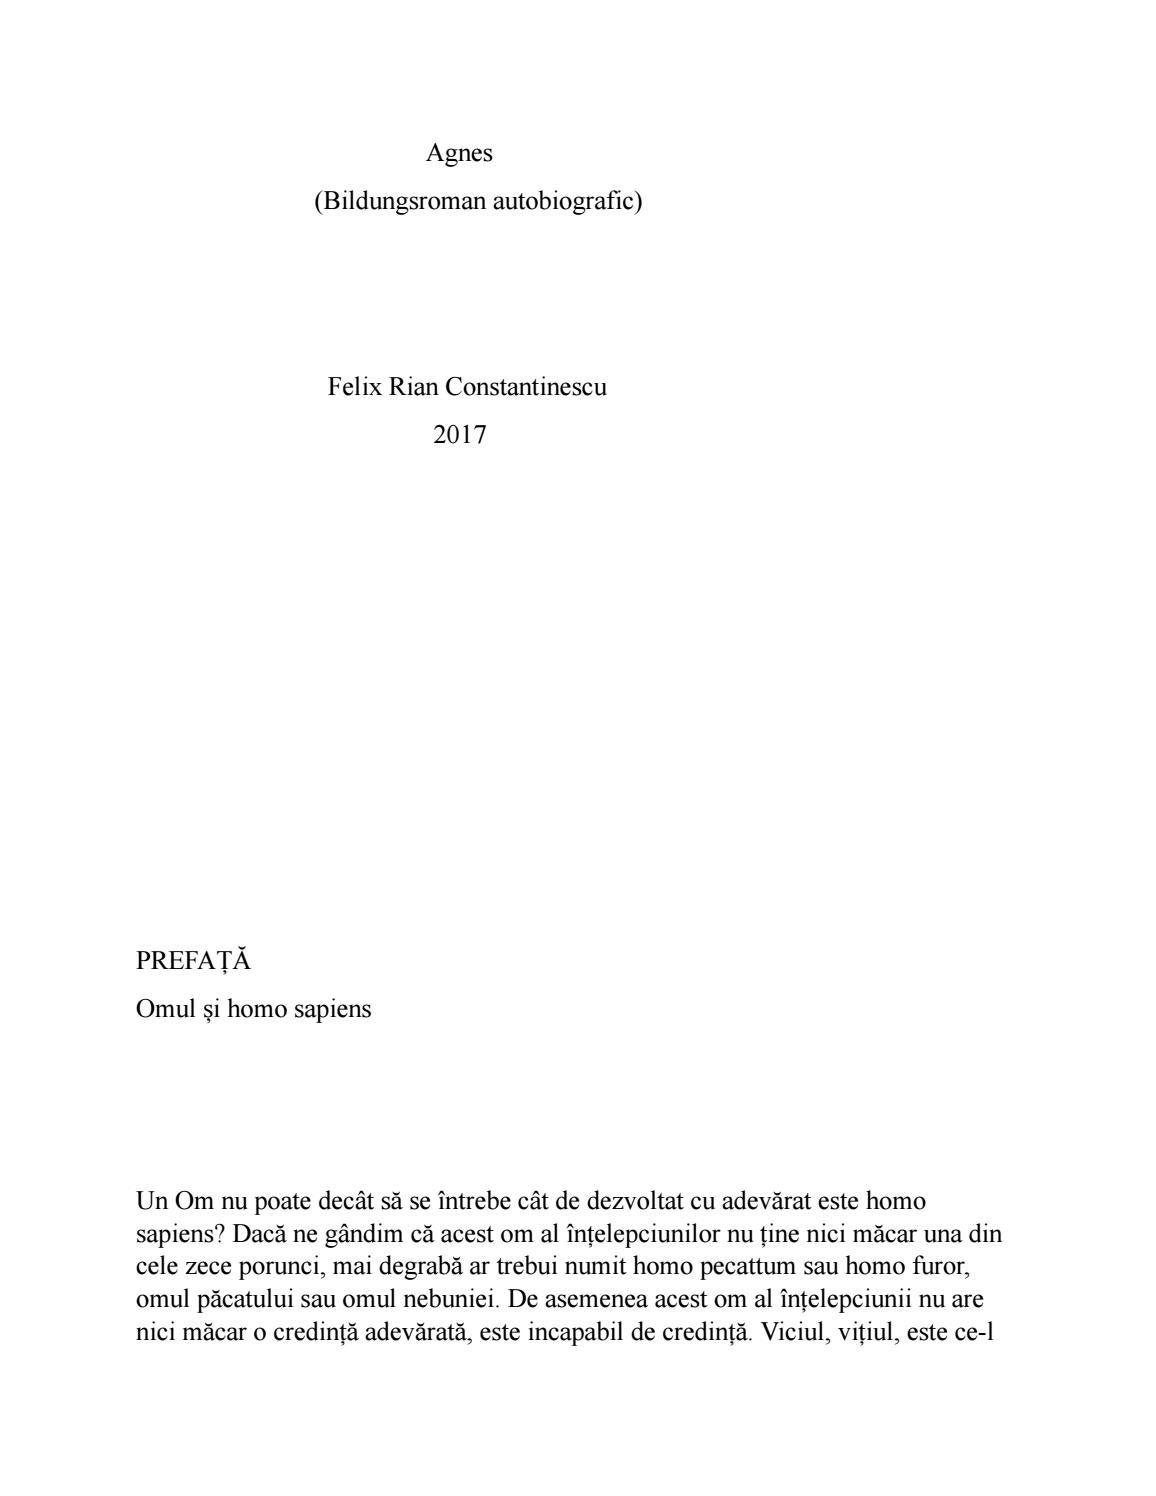 Erectie slaba - Pagina 6 - | Comunitatea iasiservicii.ro